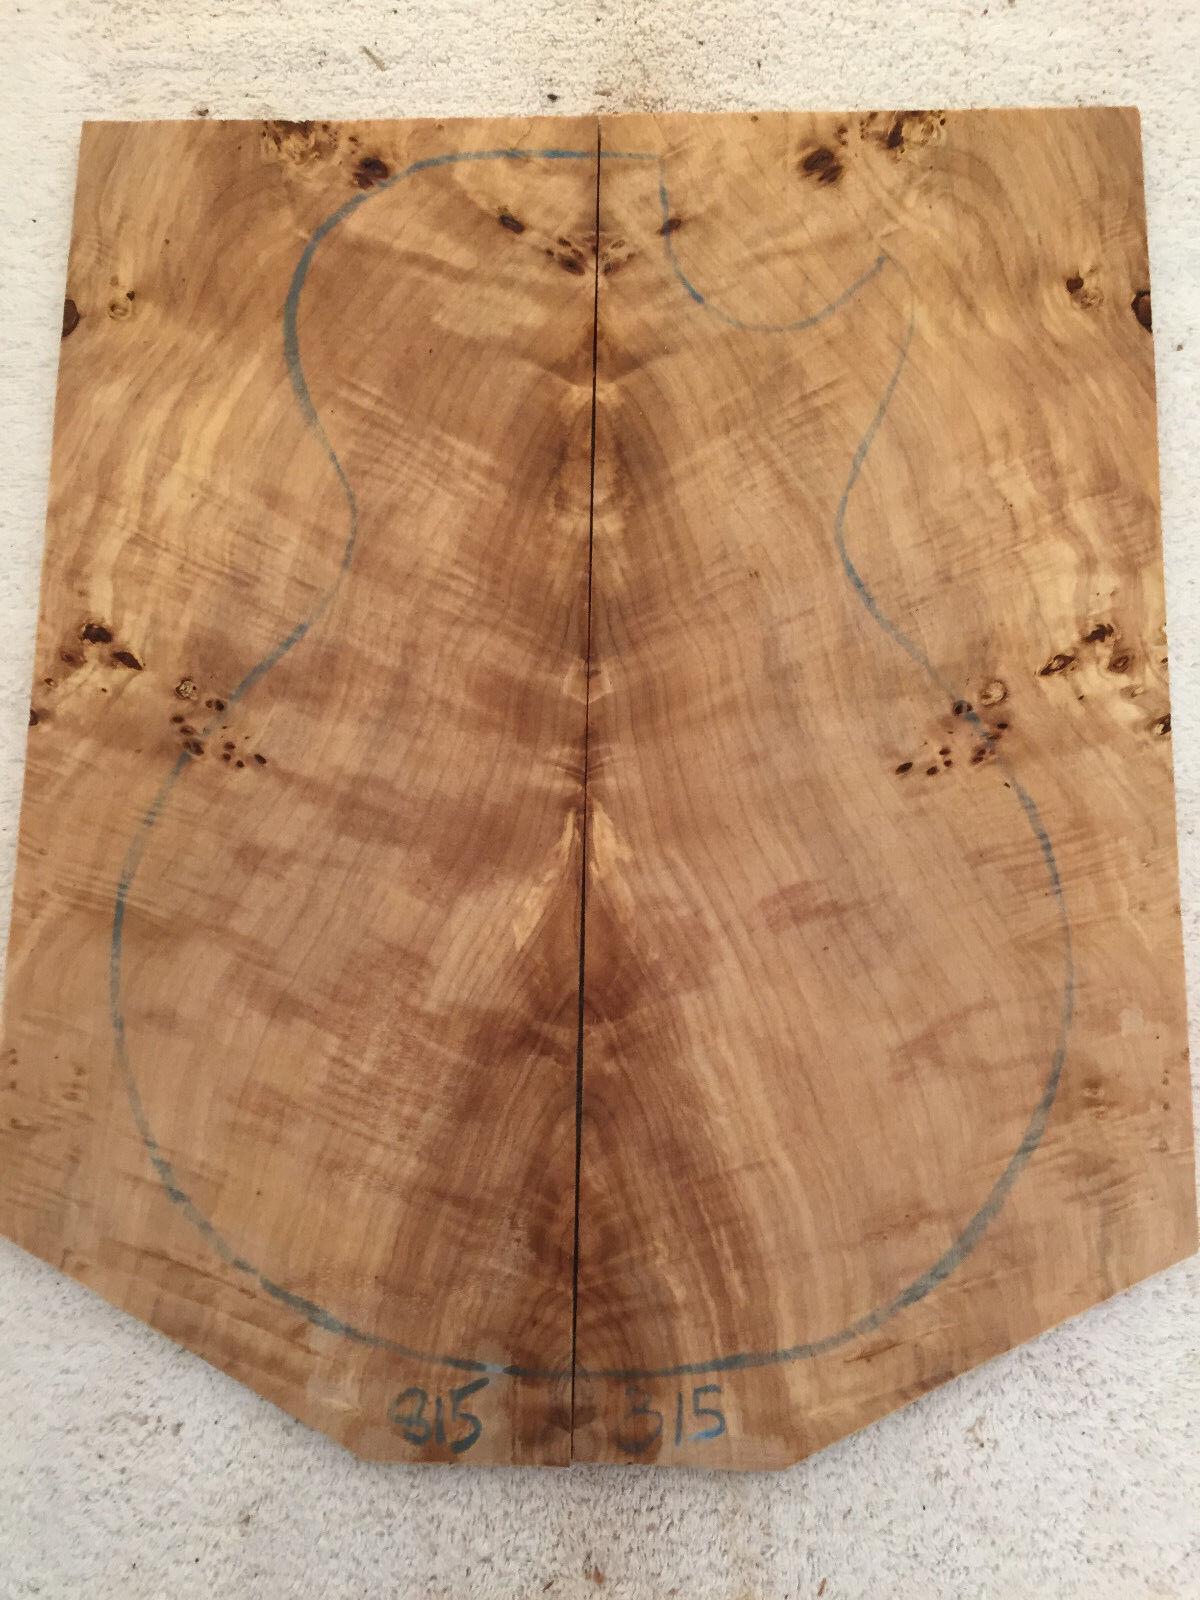 Poplar Burl Guitar Bookmatch Set Musical Luthier tone wood .29 x 16 x 19   815